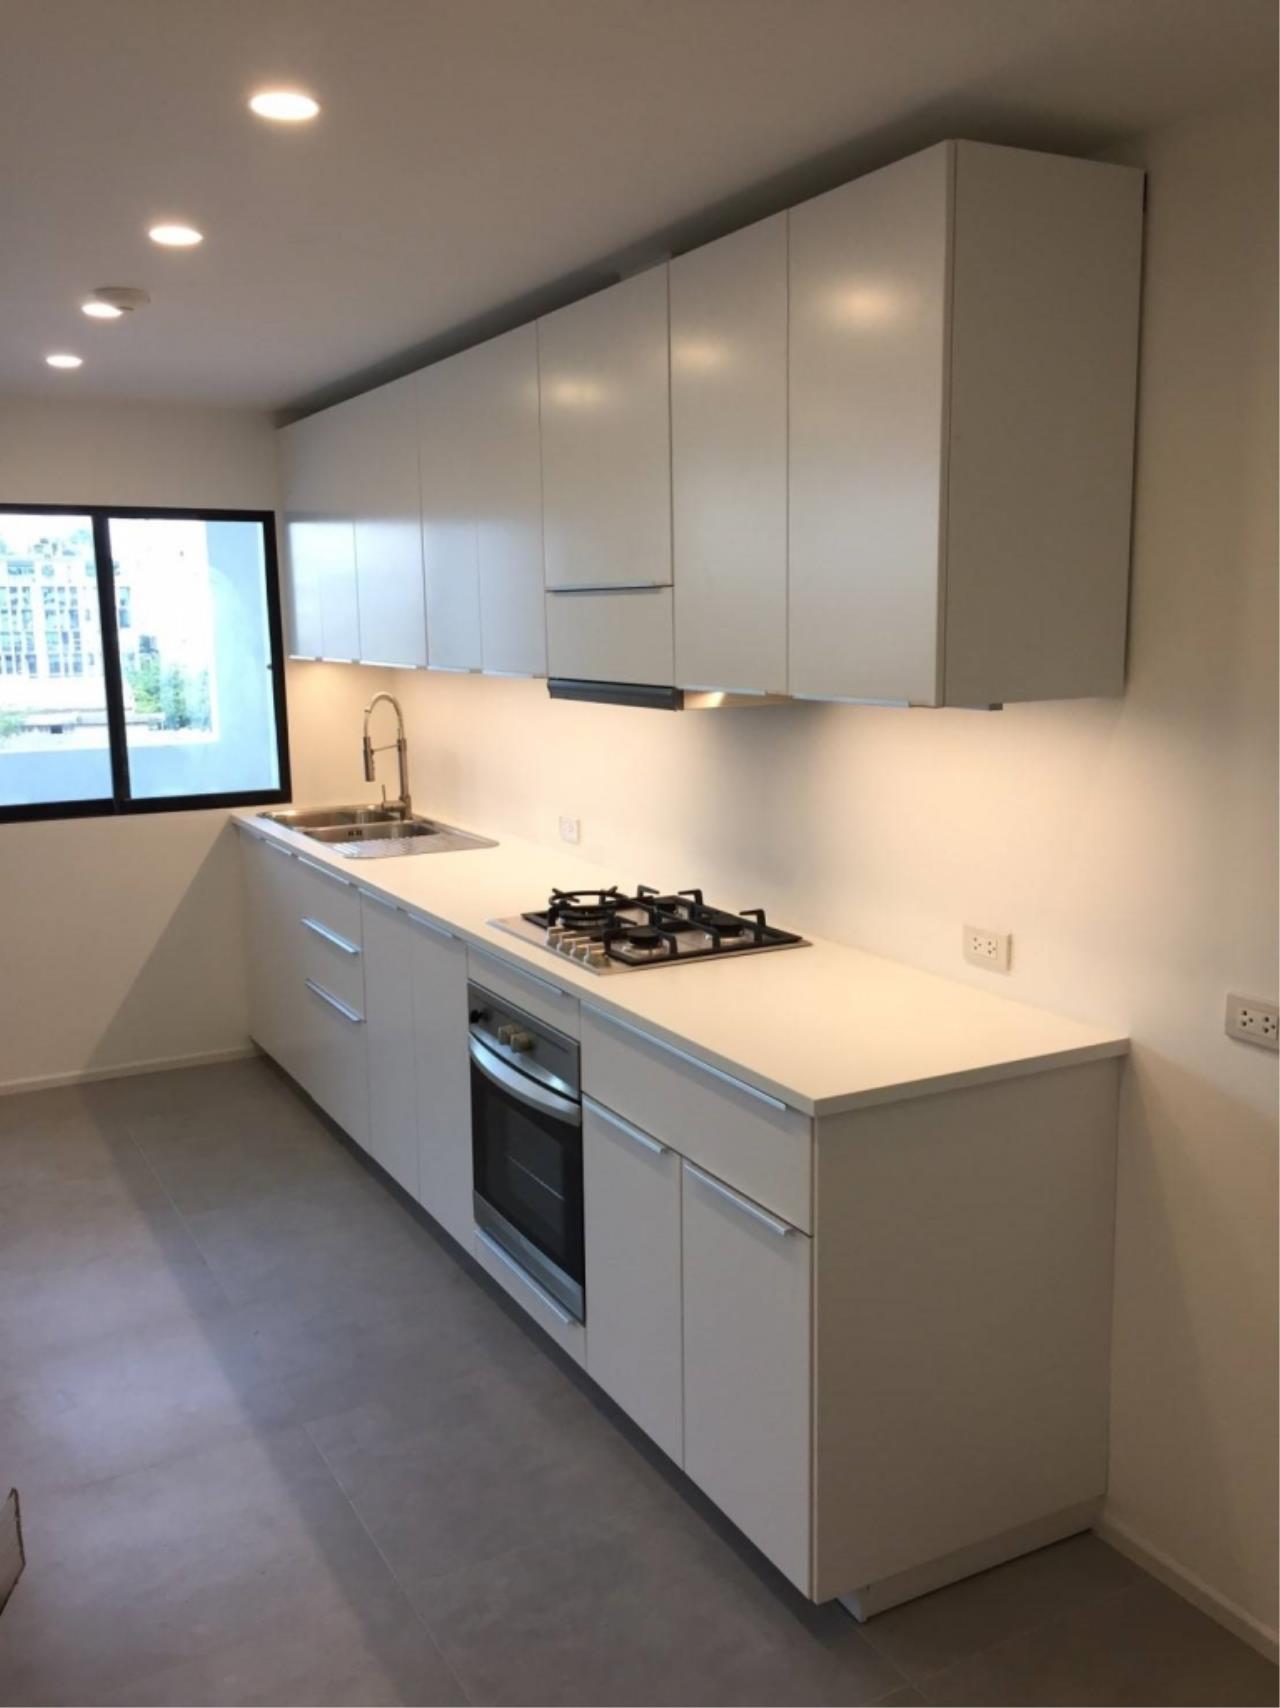 Century21 Skylux Agency's D.S. Tower 2 Sukhumvit 39 / Condo For Rent / 3 Bedroom / 140 SQM / BTS Phrom Phong / Bangkok 4